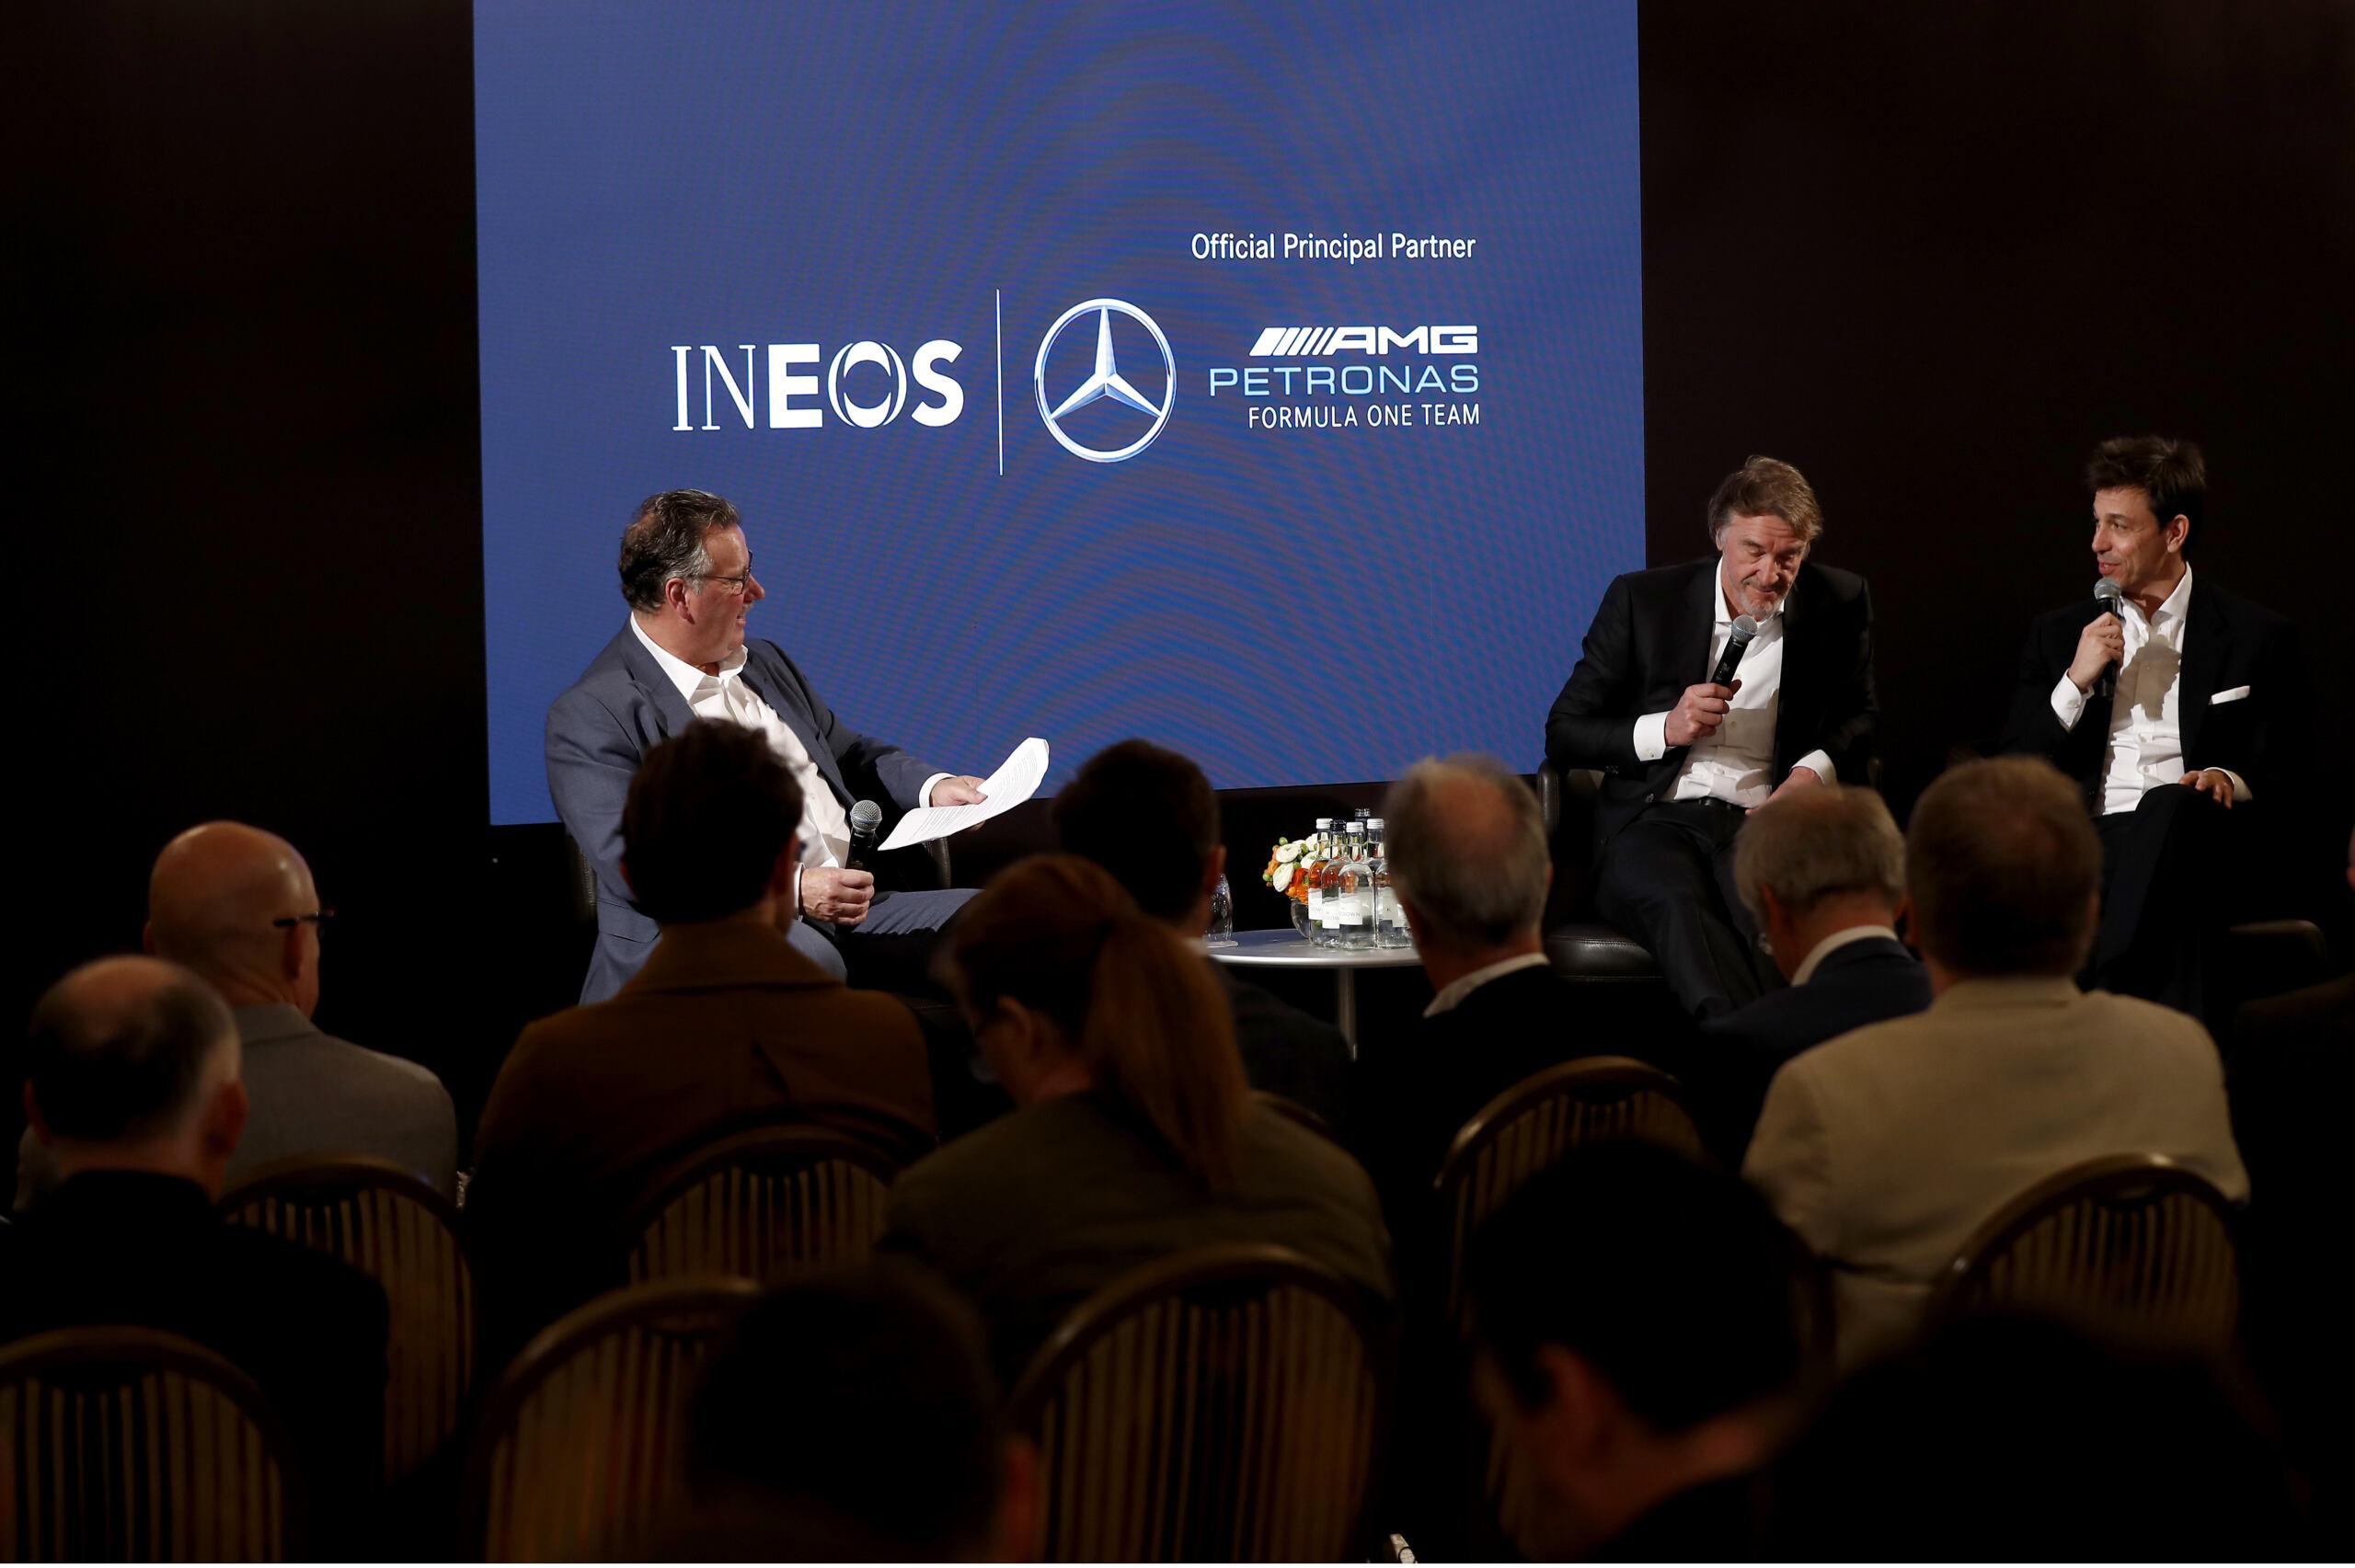 Mercedes-AMG Petronas INEOS partnership principale